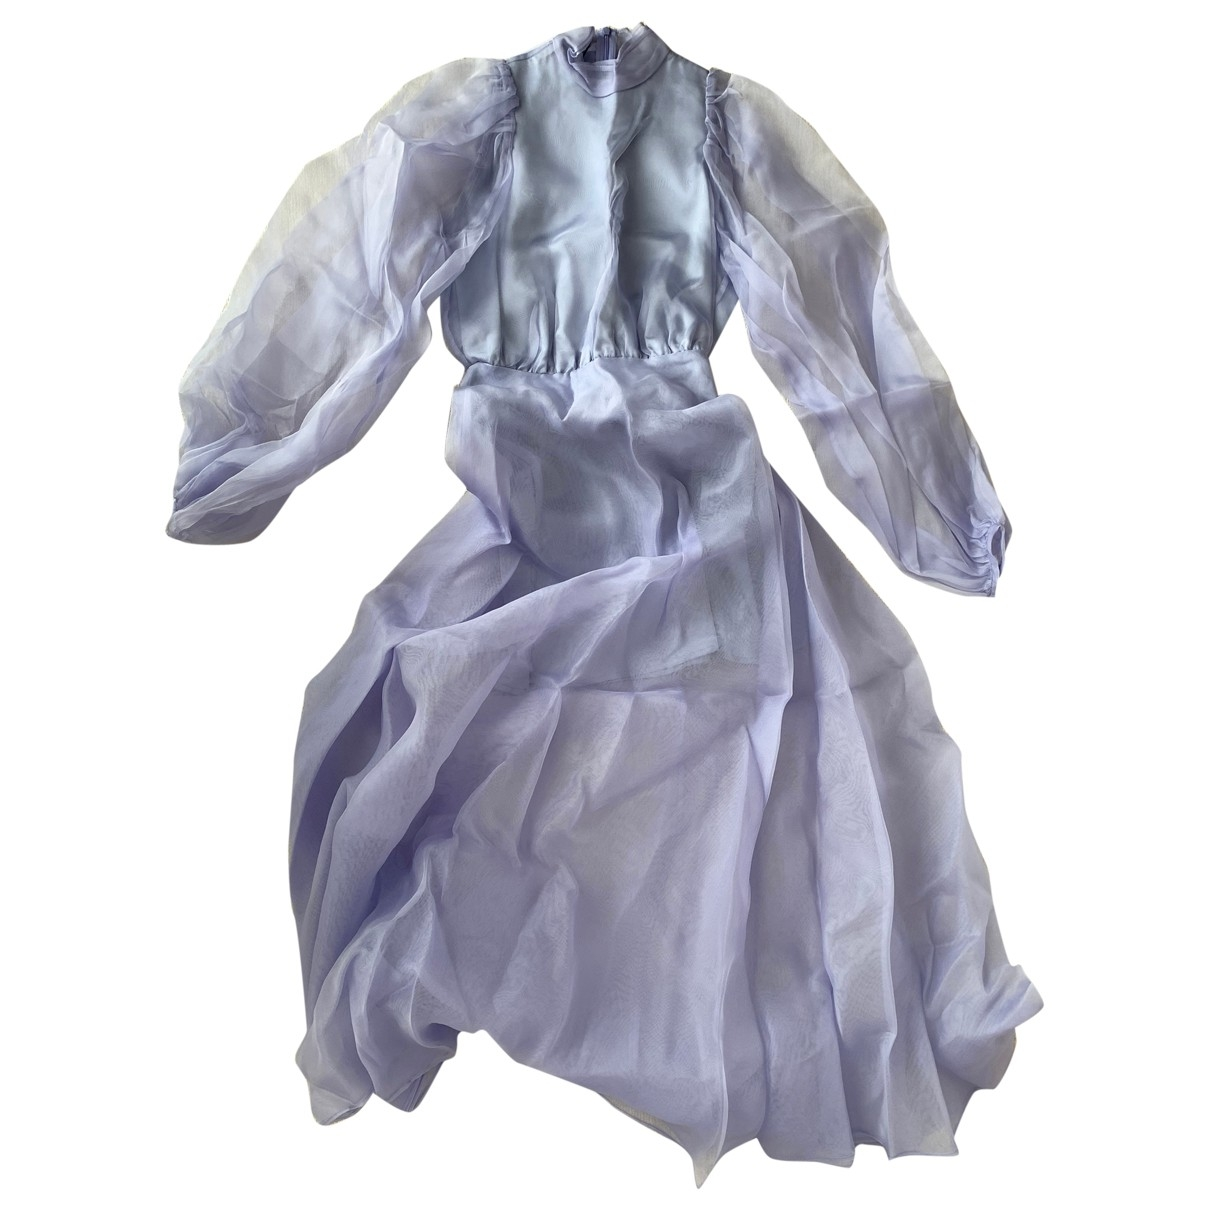 Beaufille \N Silk dress for Women 0 0-5